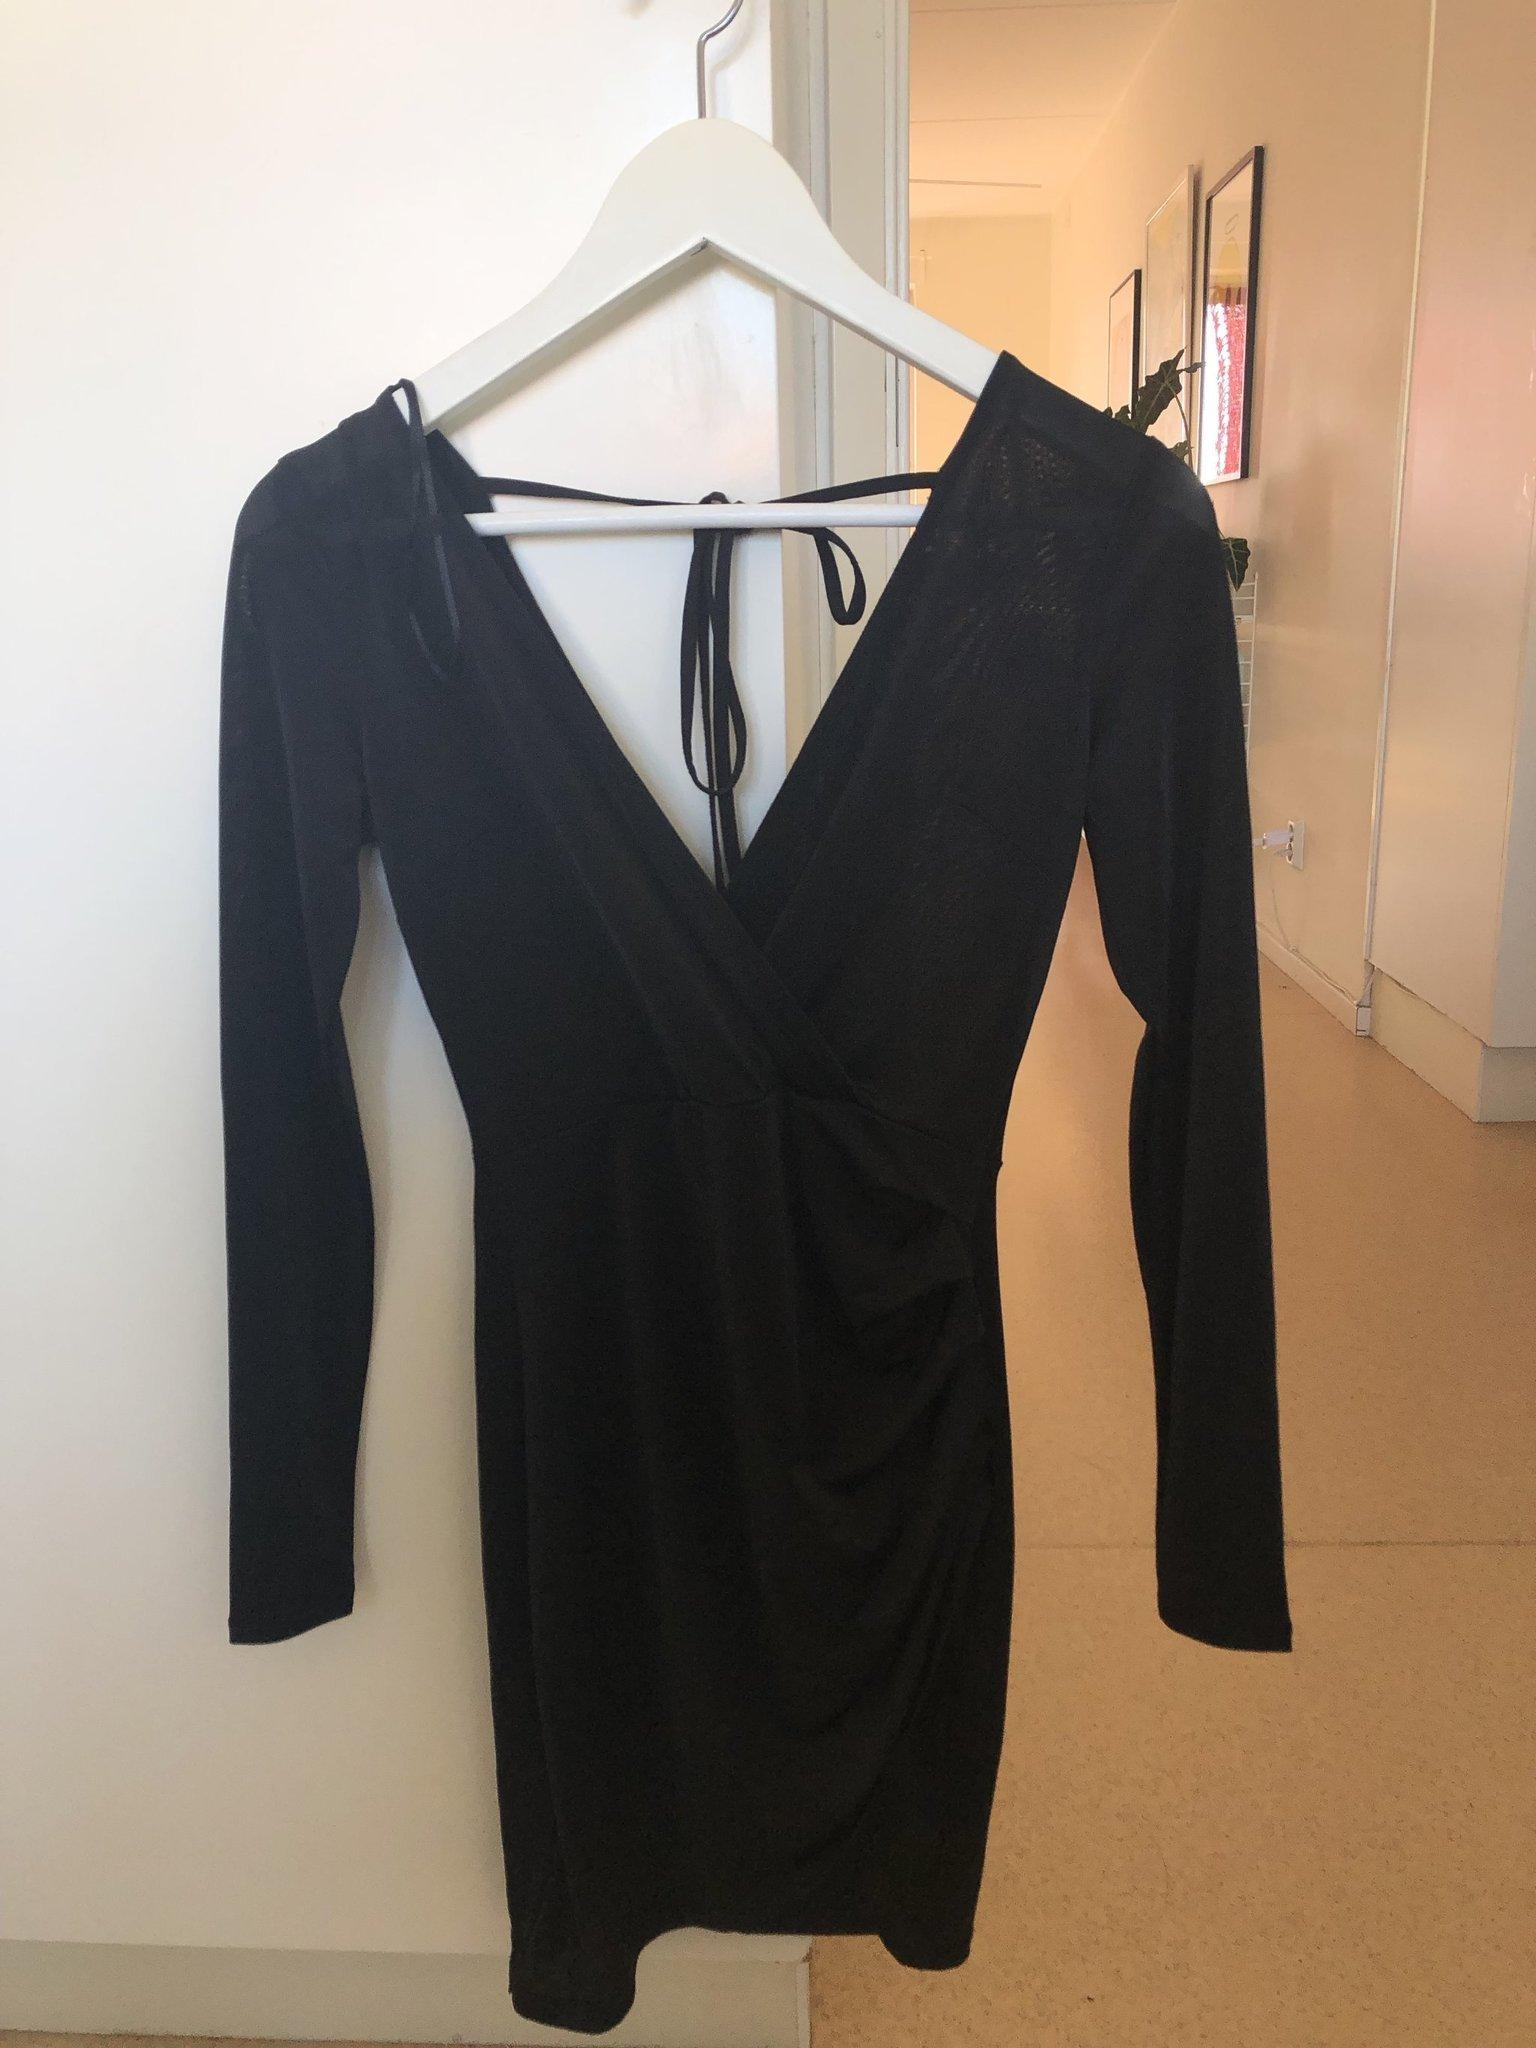 cd4f48906528 Gina Tricot Open back black dress (348791175) ᐈ Köp på Tradera